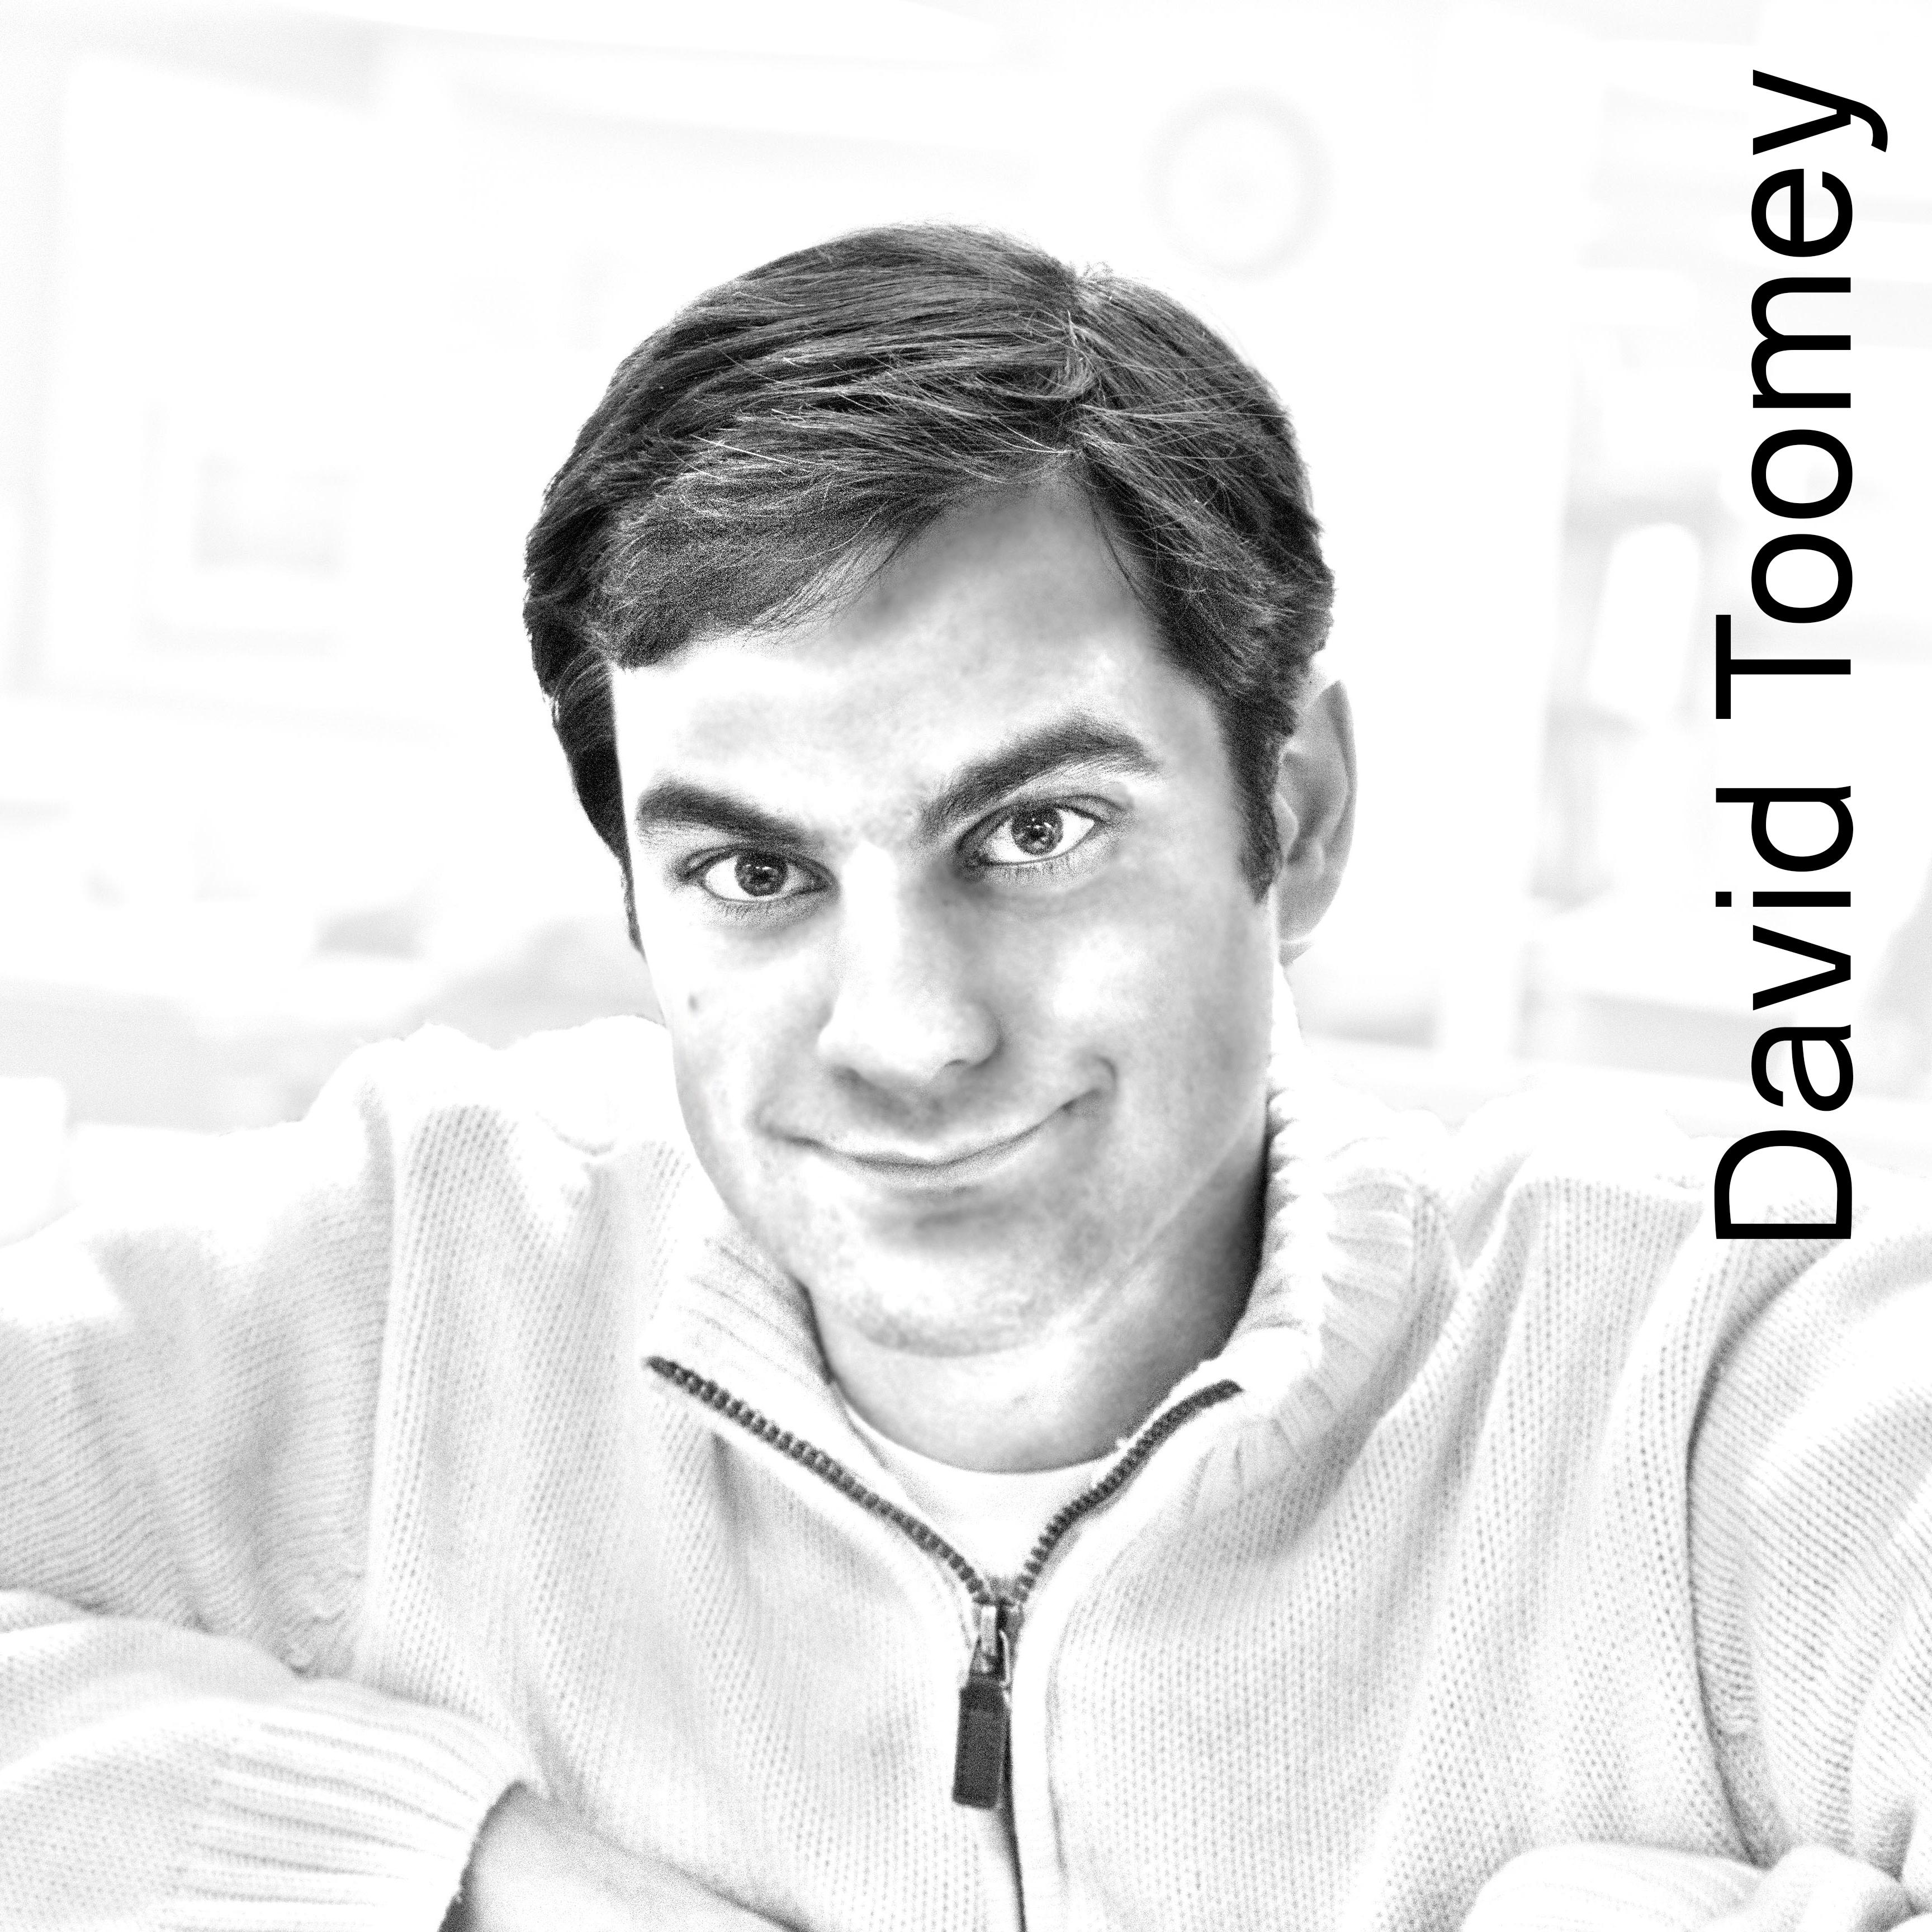 david_t_square.jpg